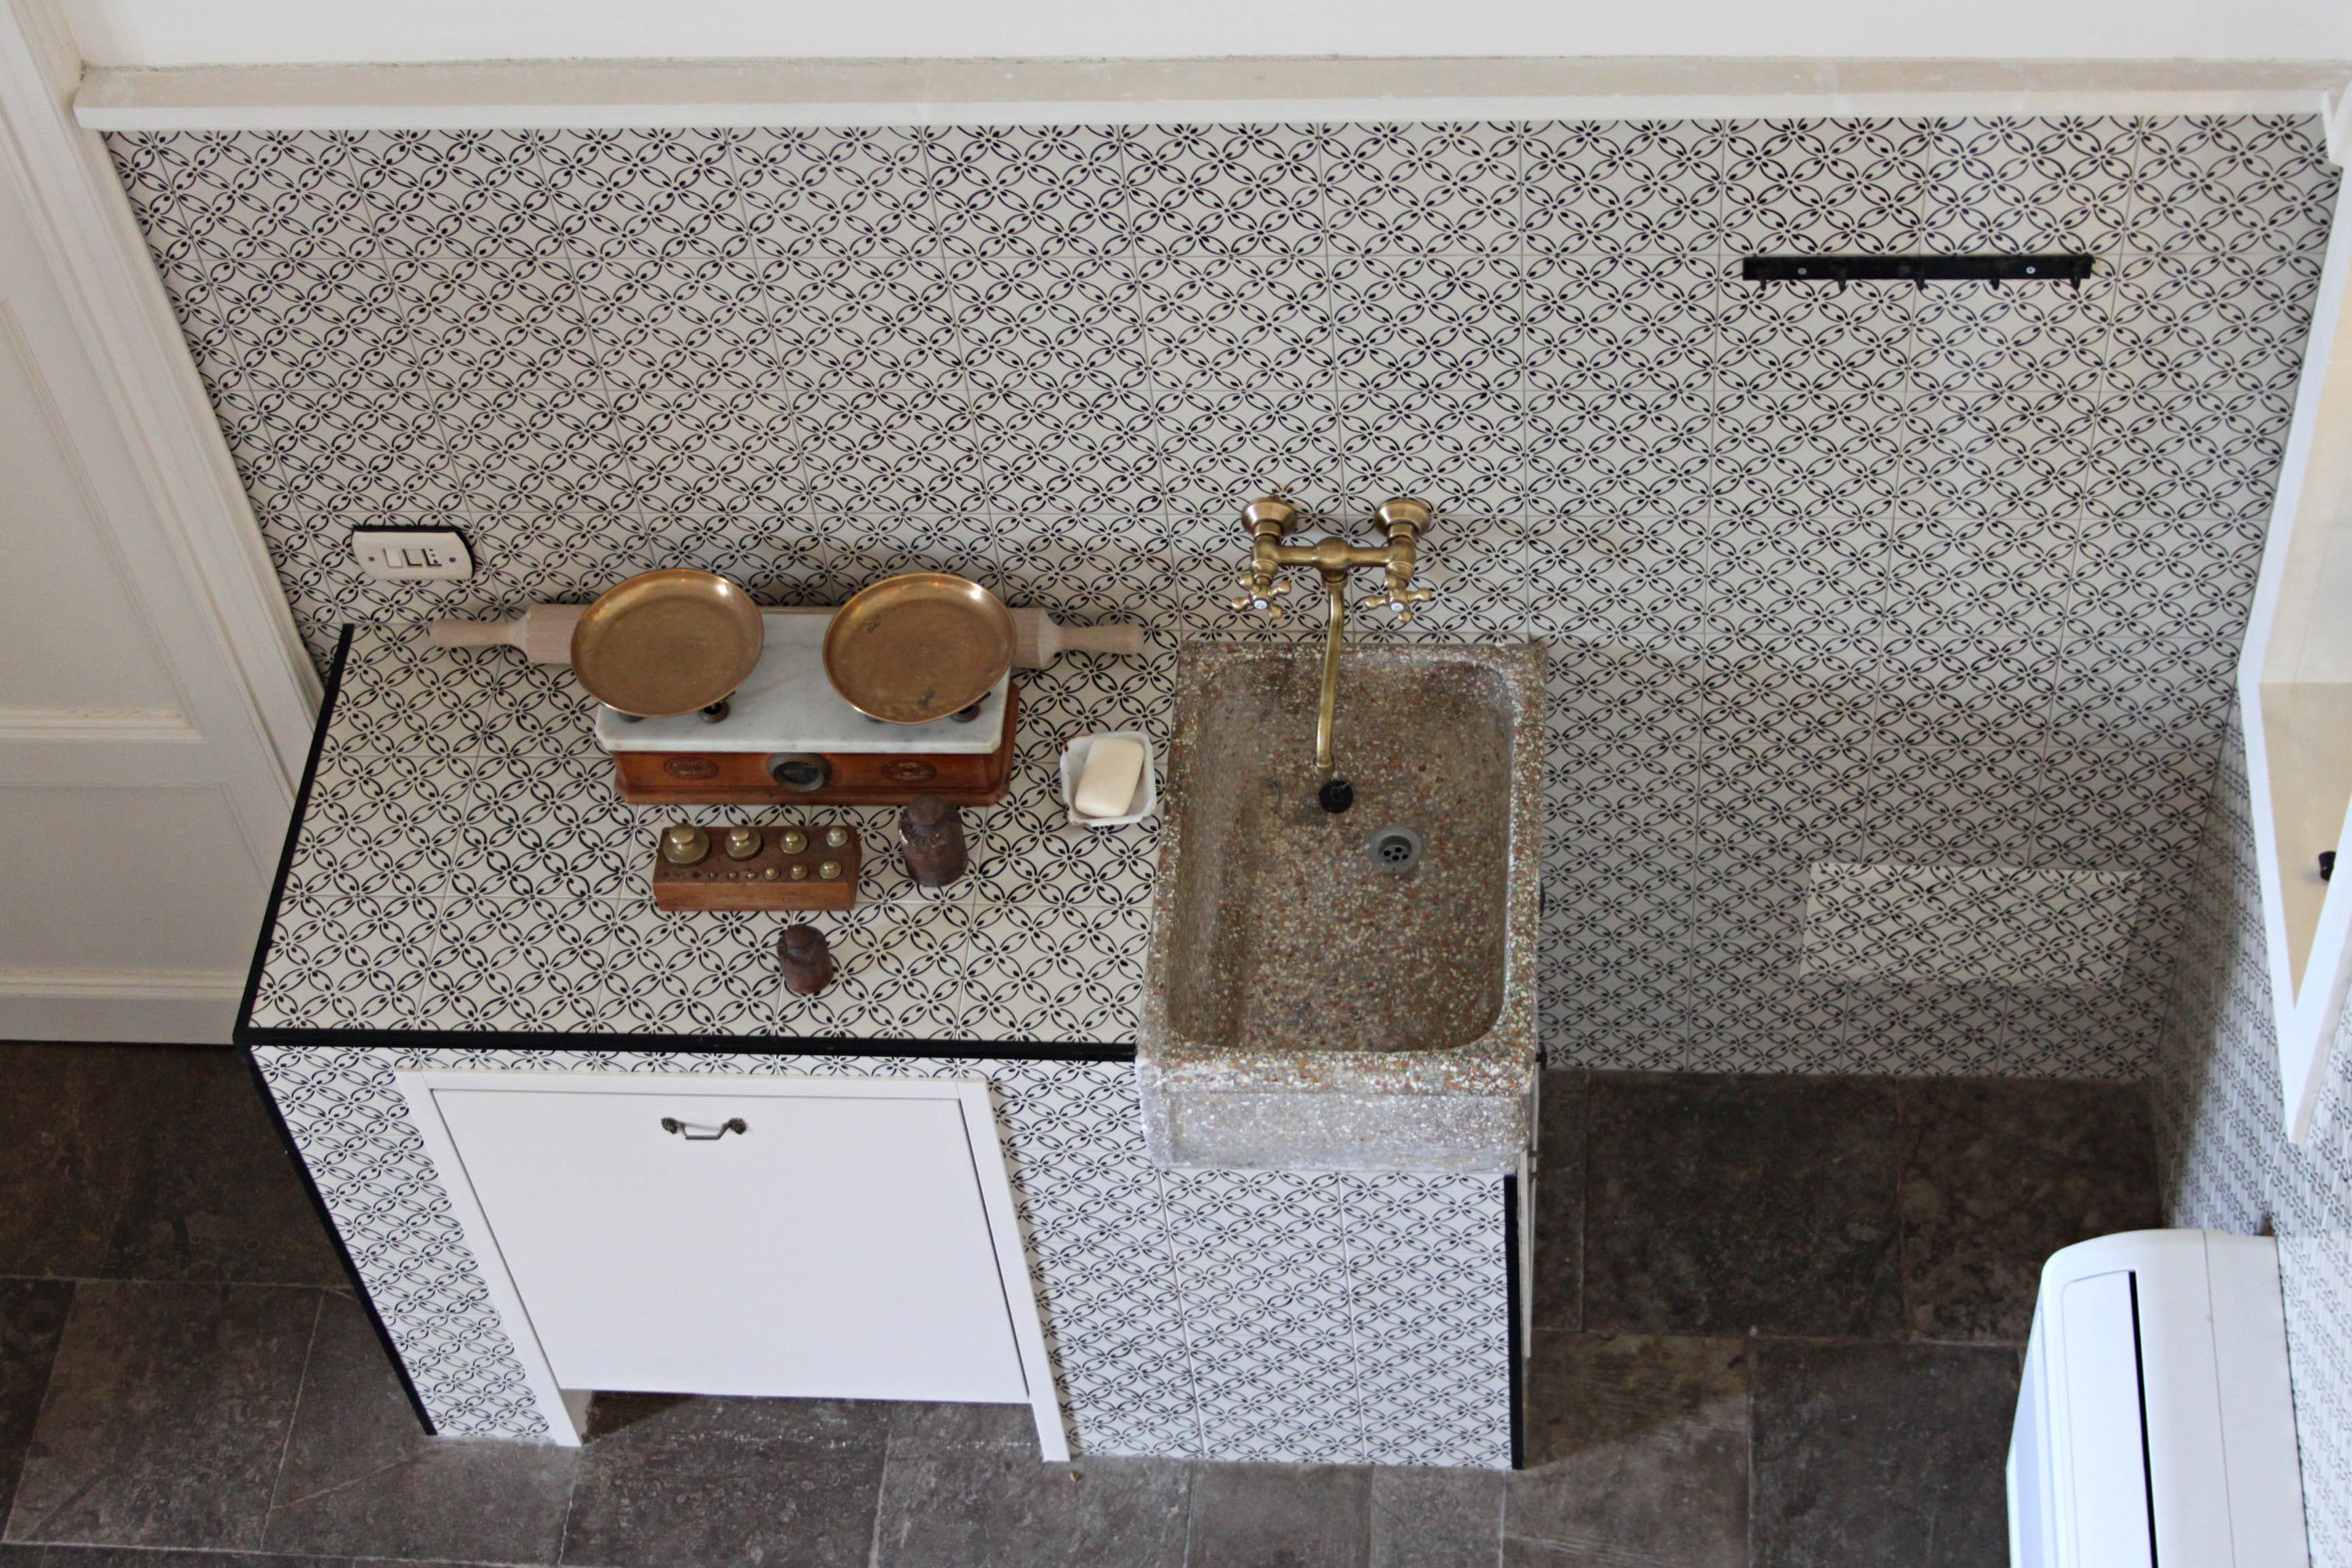 Top cucina in pietra lavica by sgarlata emanuele c - Pietra lavica cucina ...